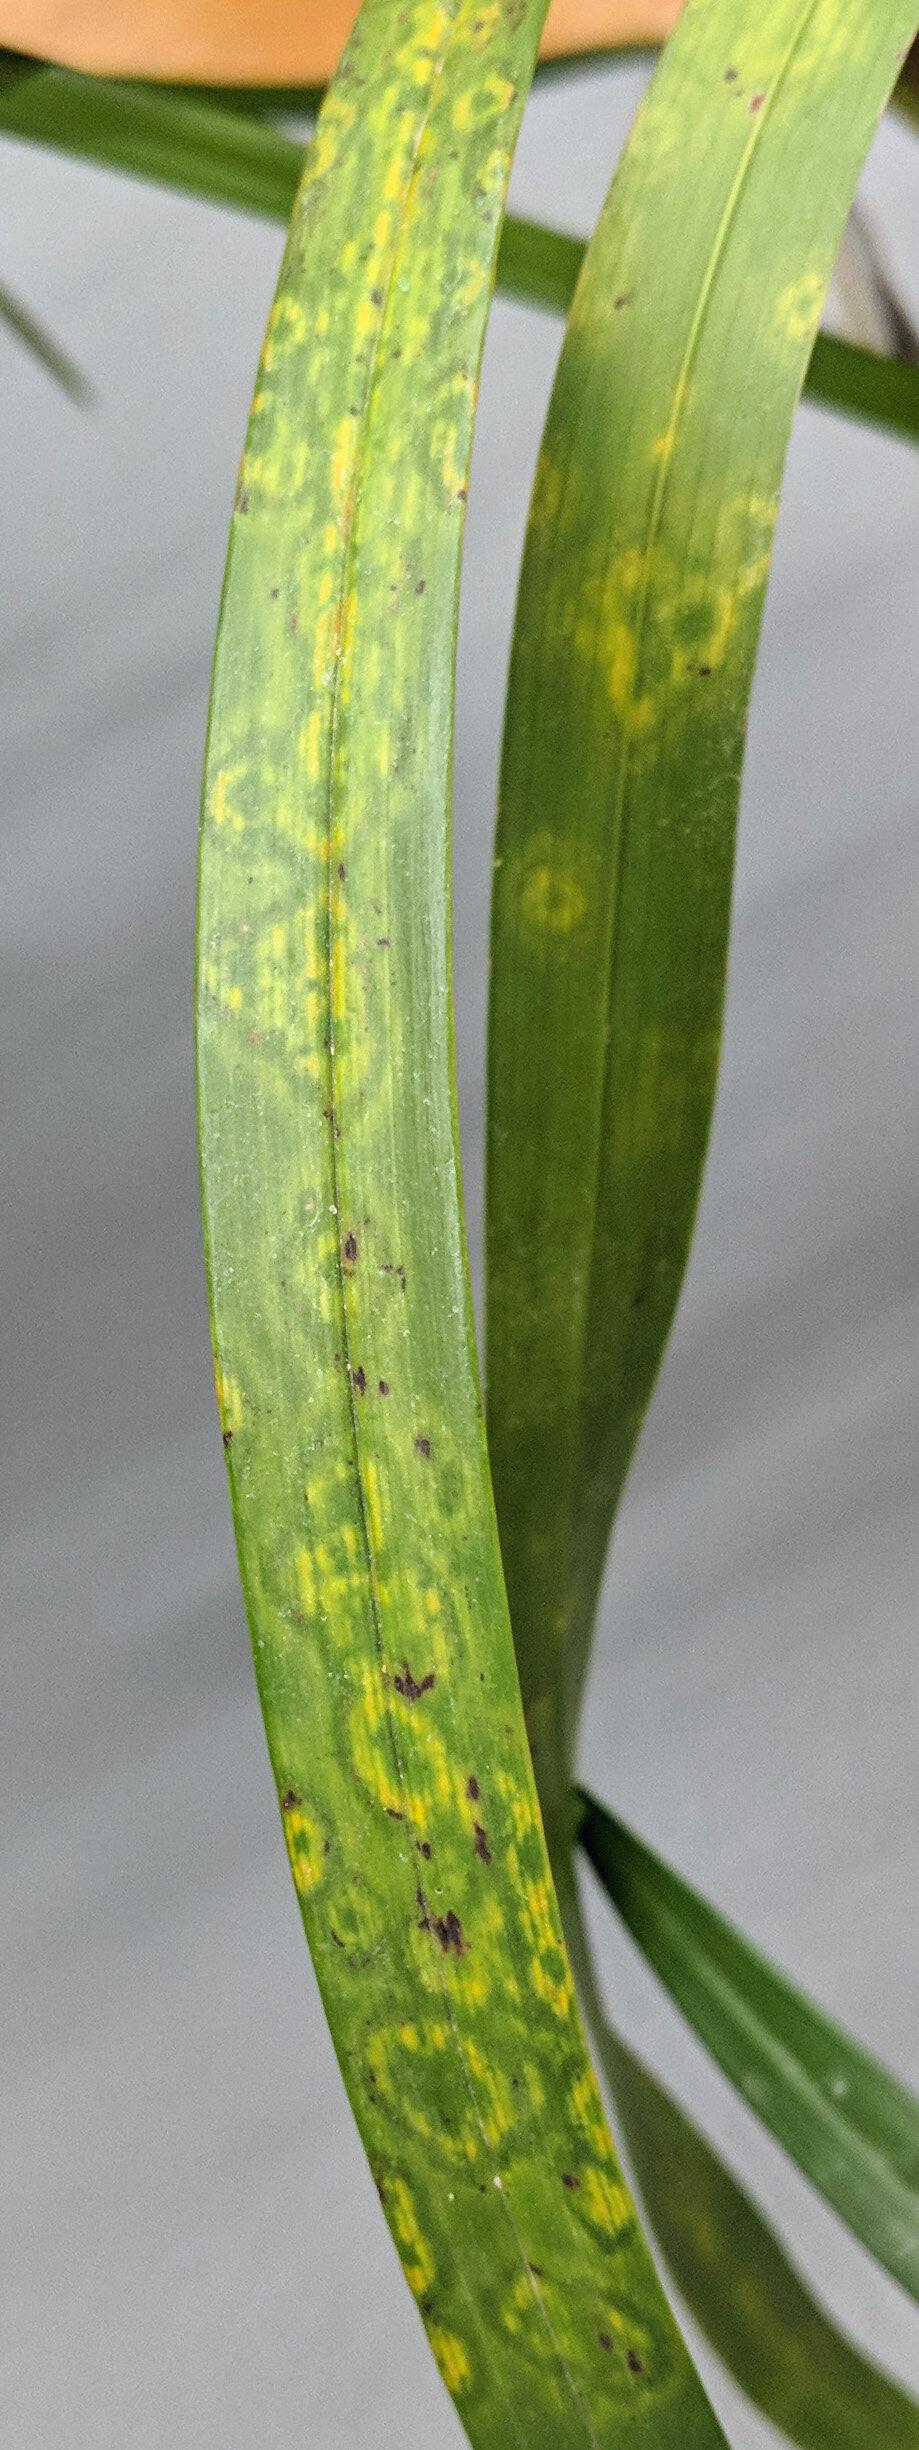 Odontoglossum ringspot virus